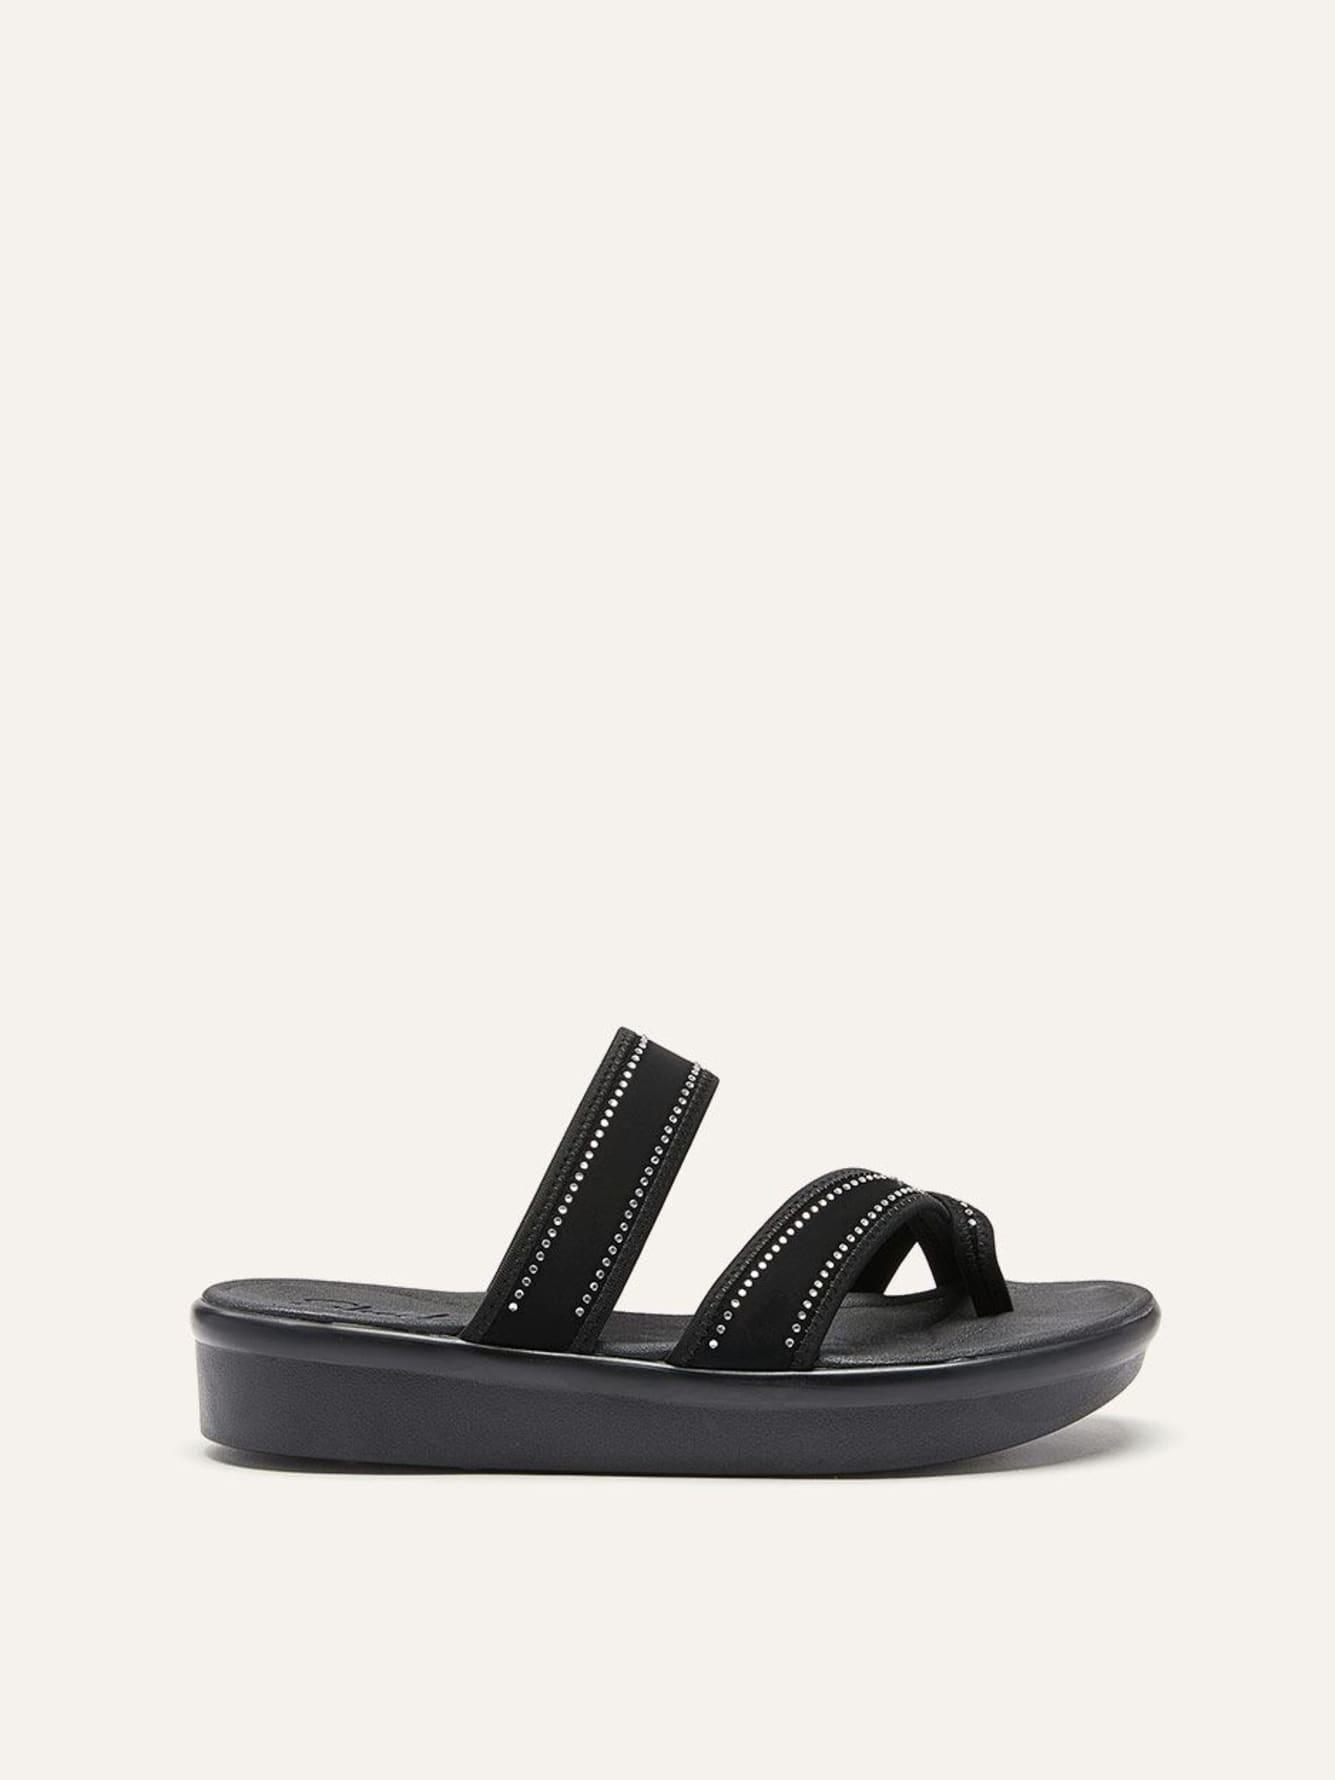 955a036ff0a0 Skechers - Rhinestone Slide Sandals